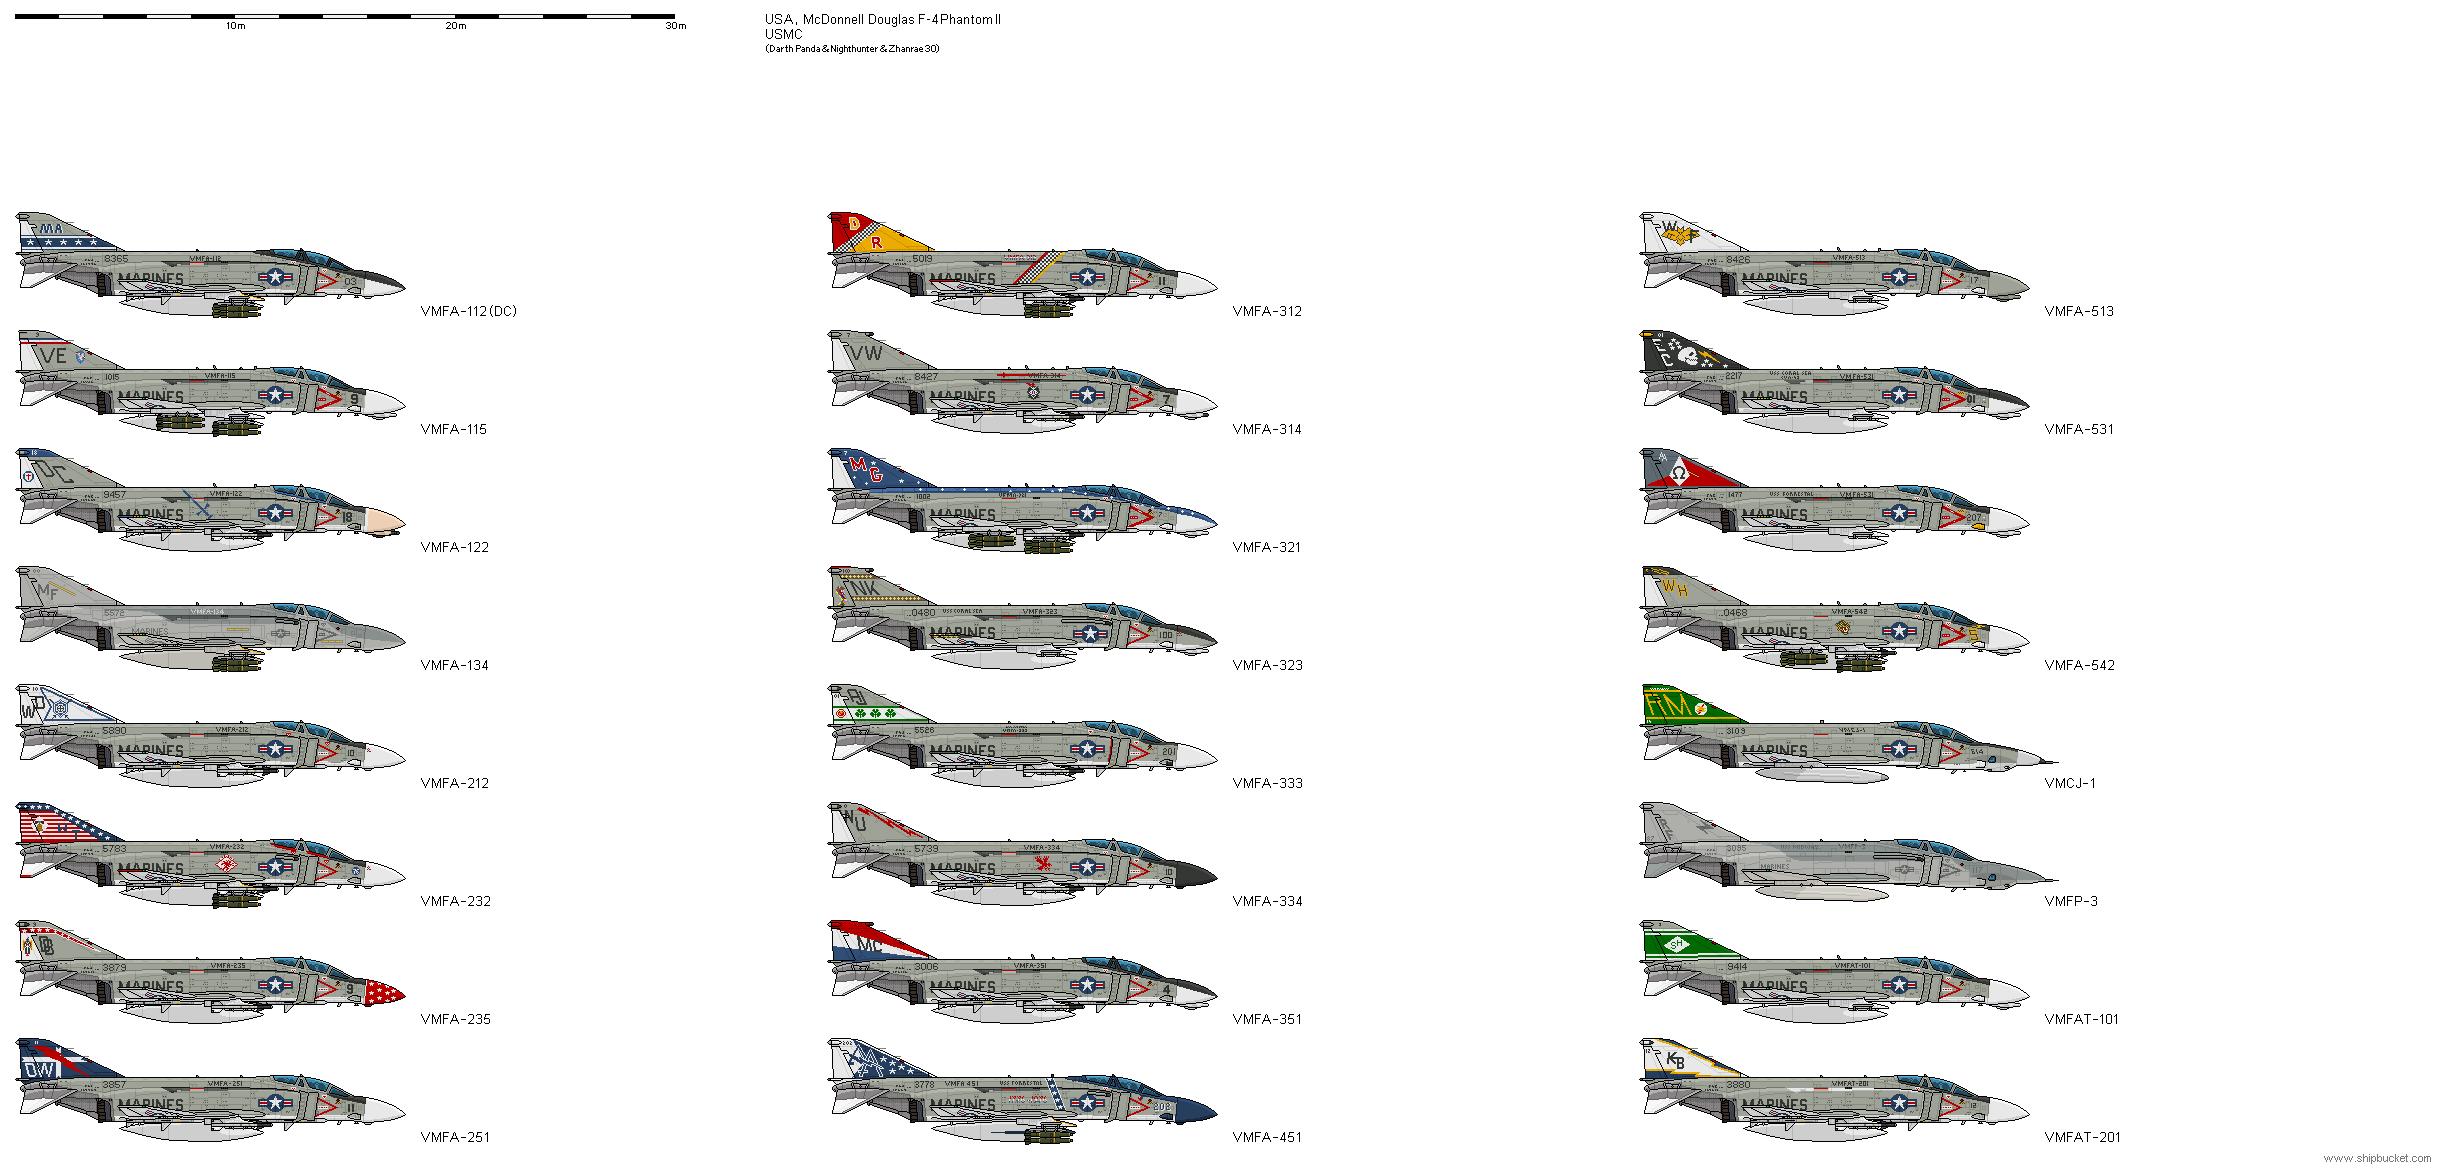 McDonnell Douglas F-4 Phantom II Society pictorial collector book Pilot bios